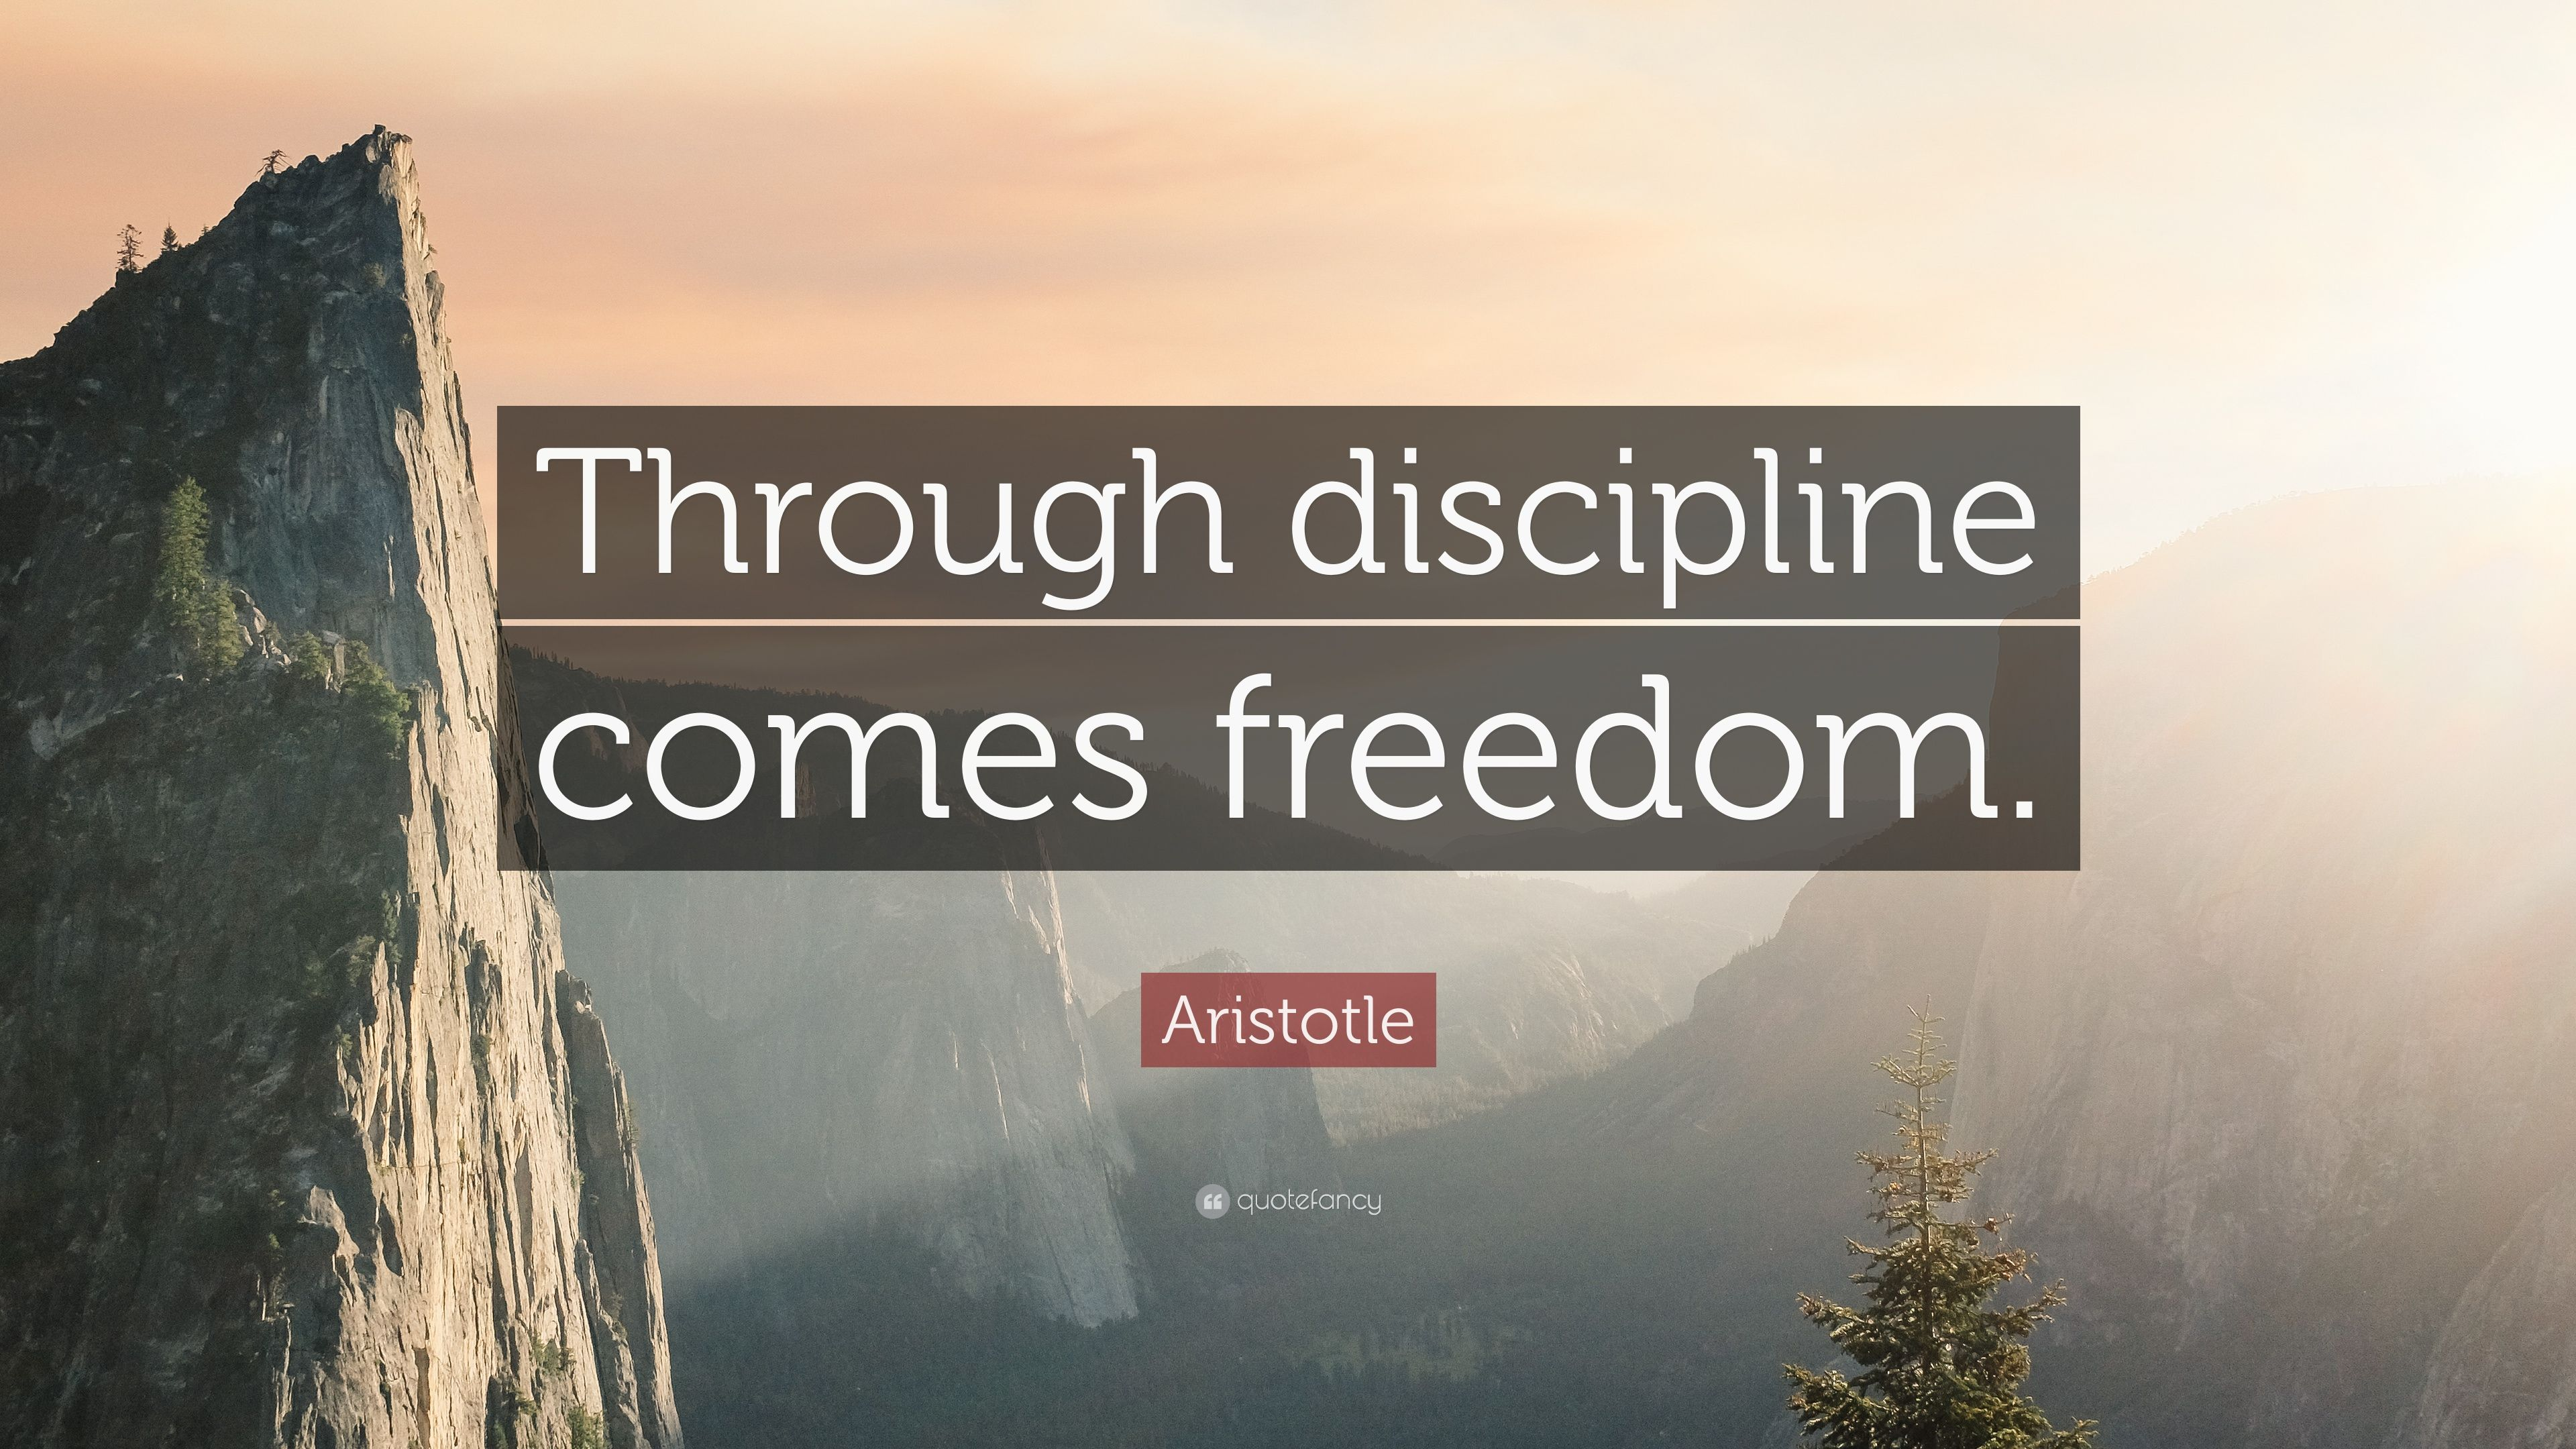 32 Best Images About Aristotle Quotes On Pinterest: Quotefancy.com Media Wallpaper 3840x2160 23395-Aristotle